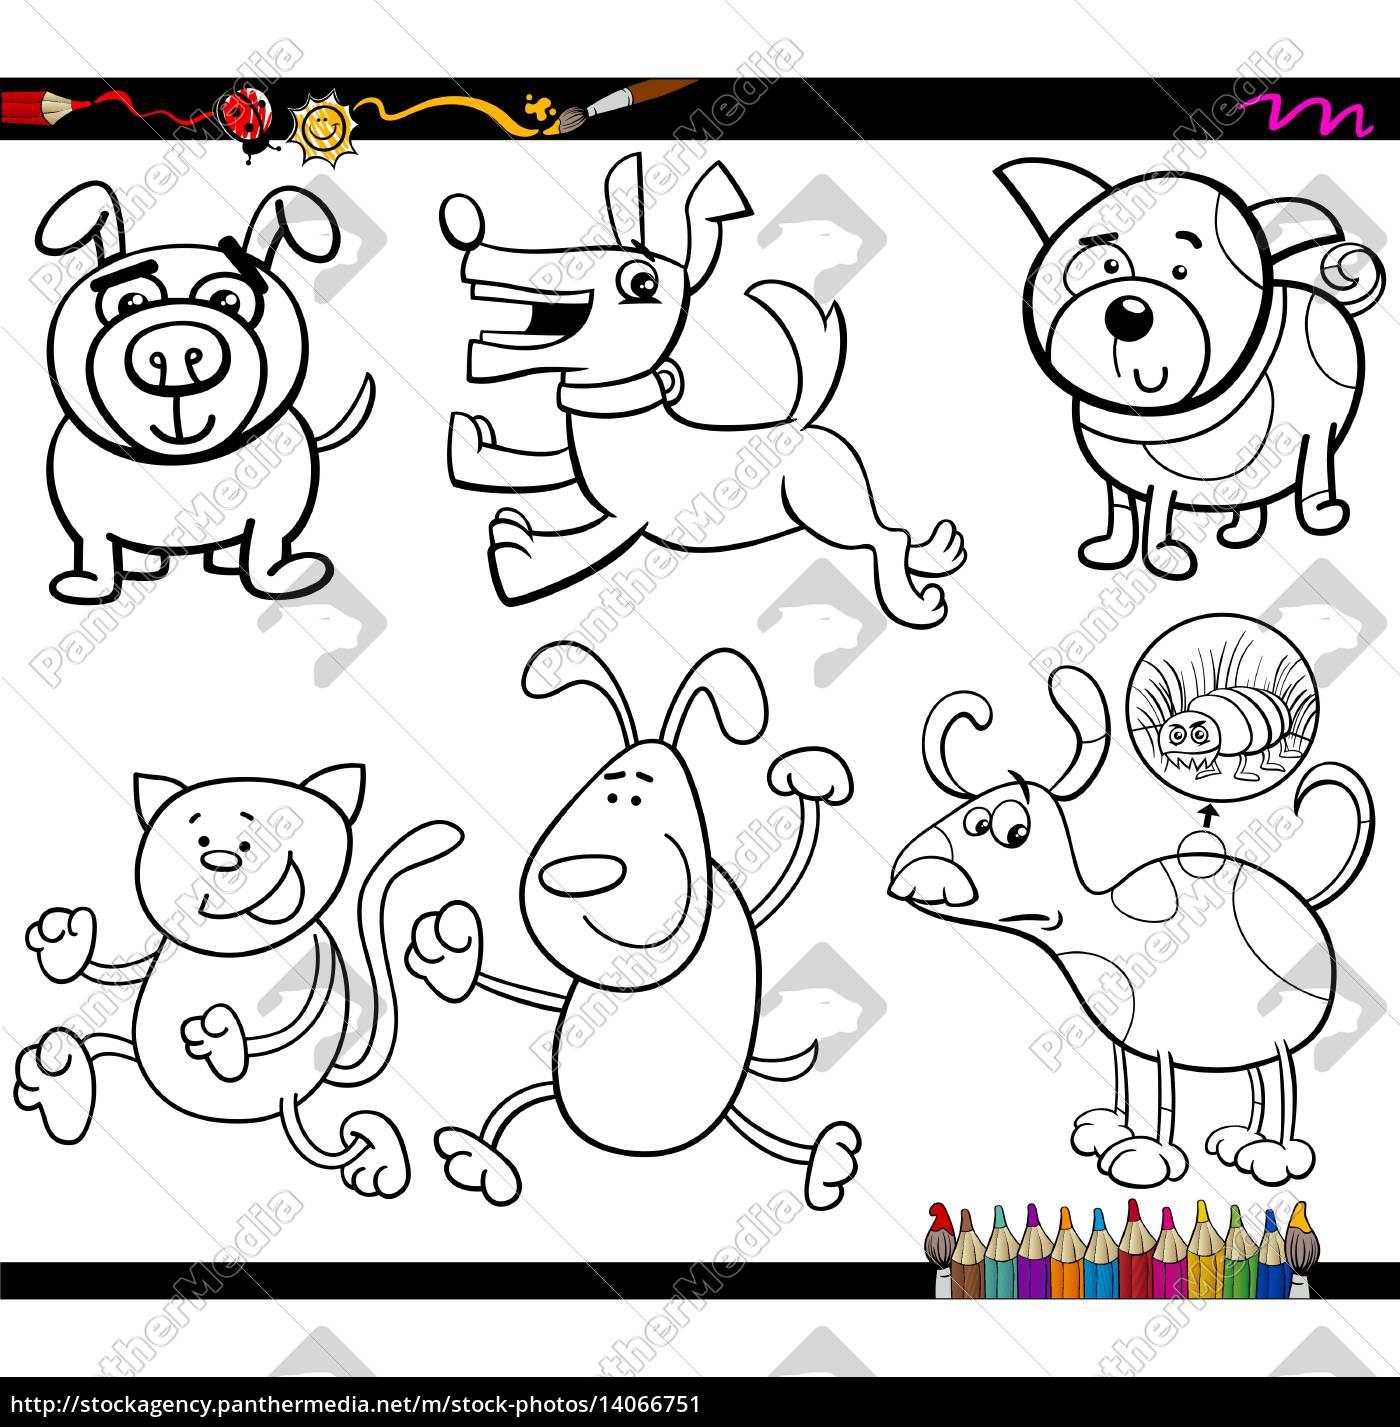 dogs set cartoon malvorlagen - stockfoto - #14066751